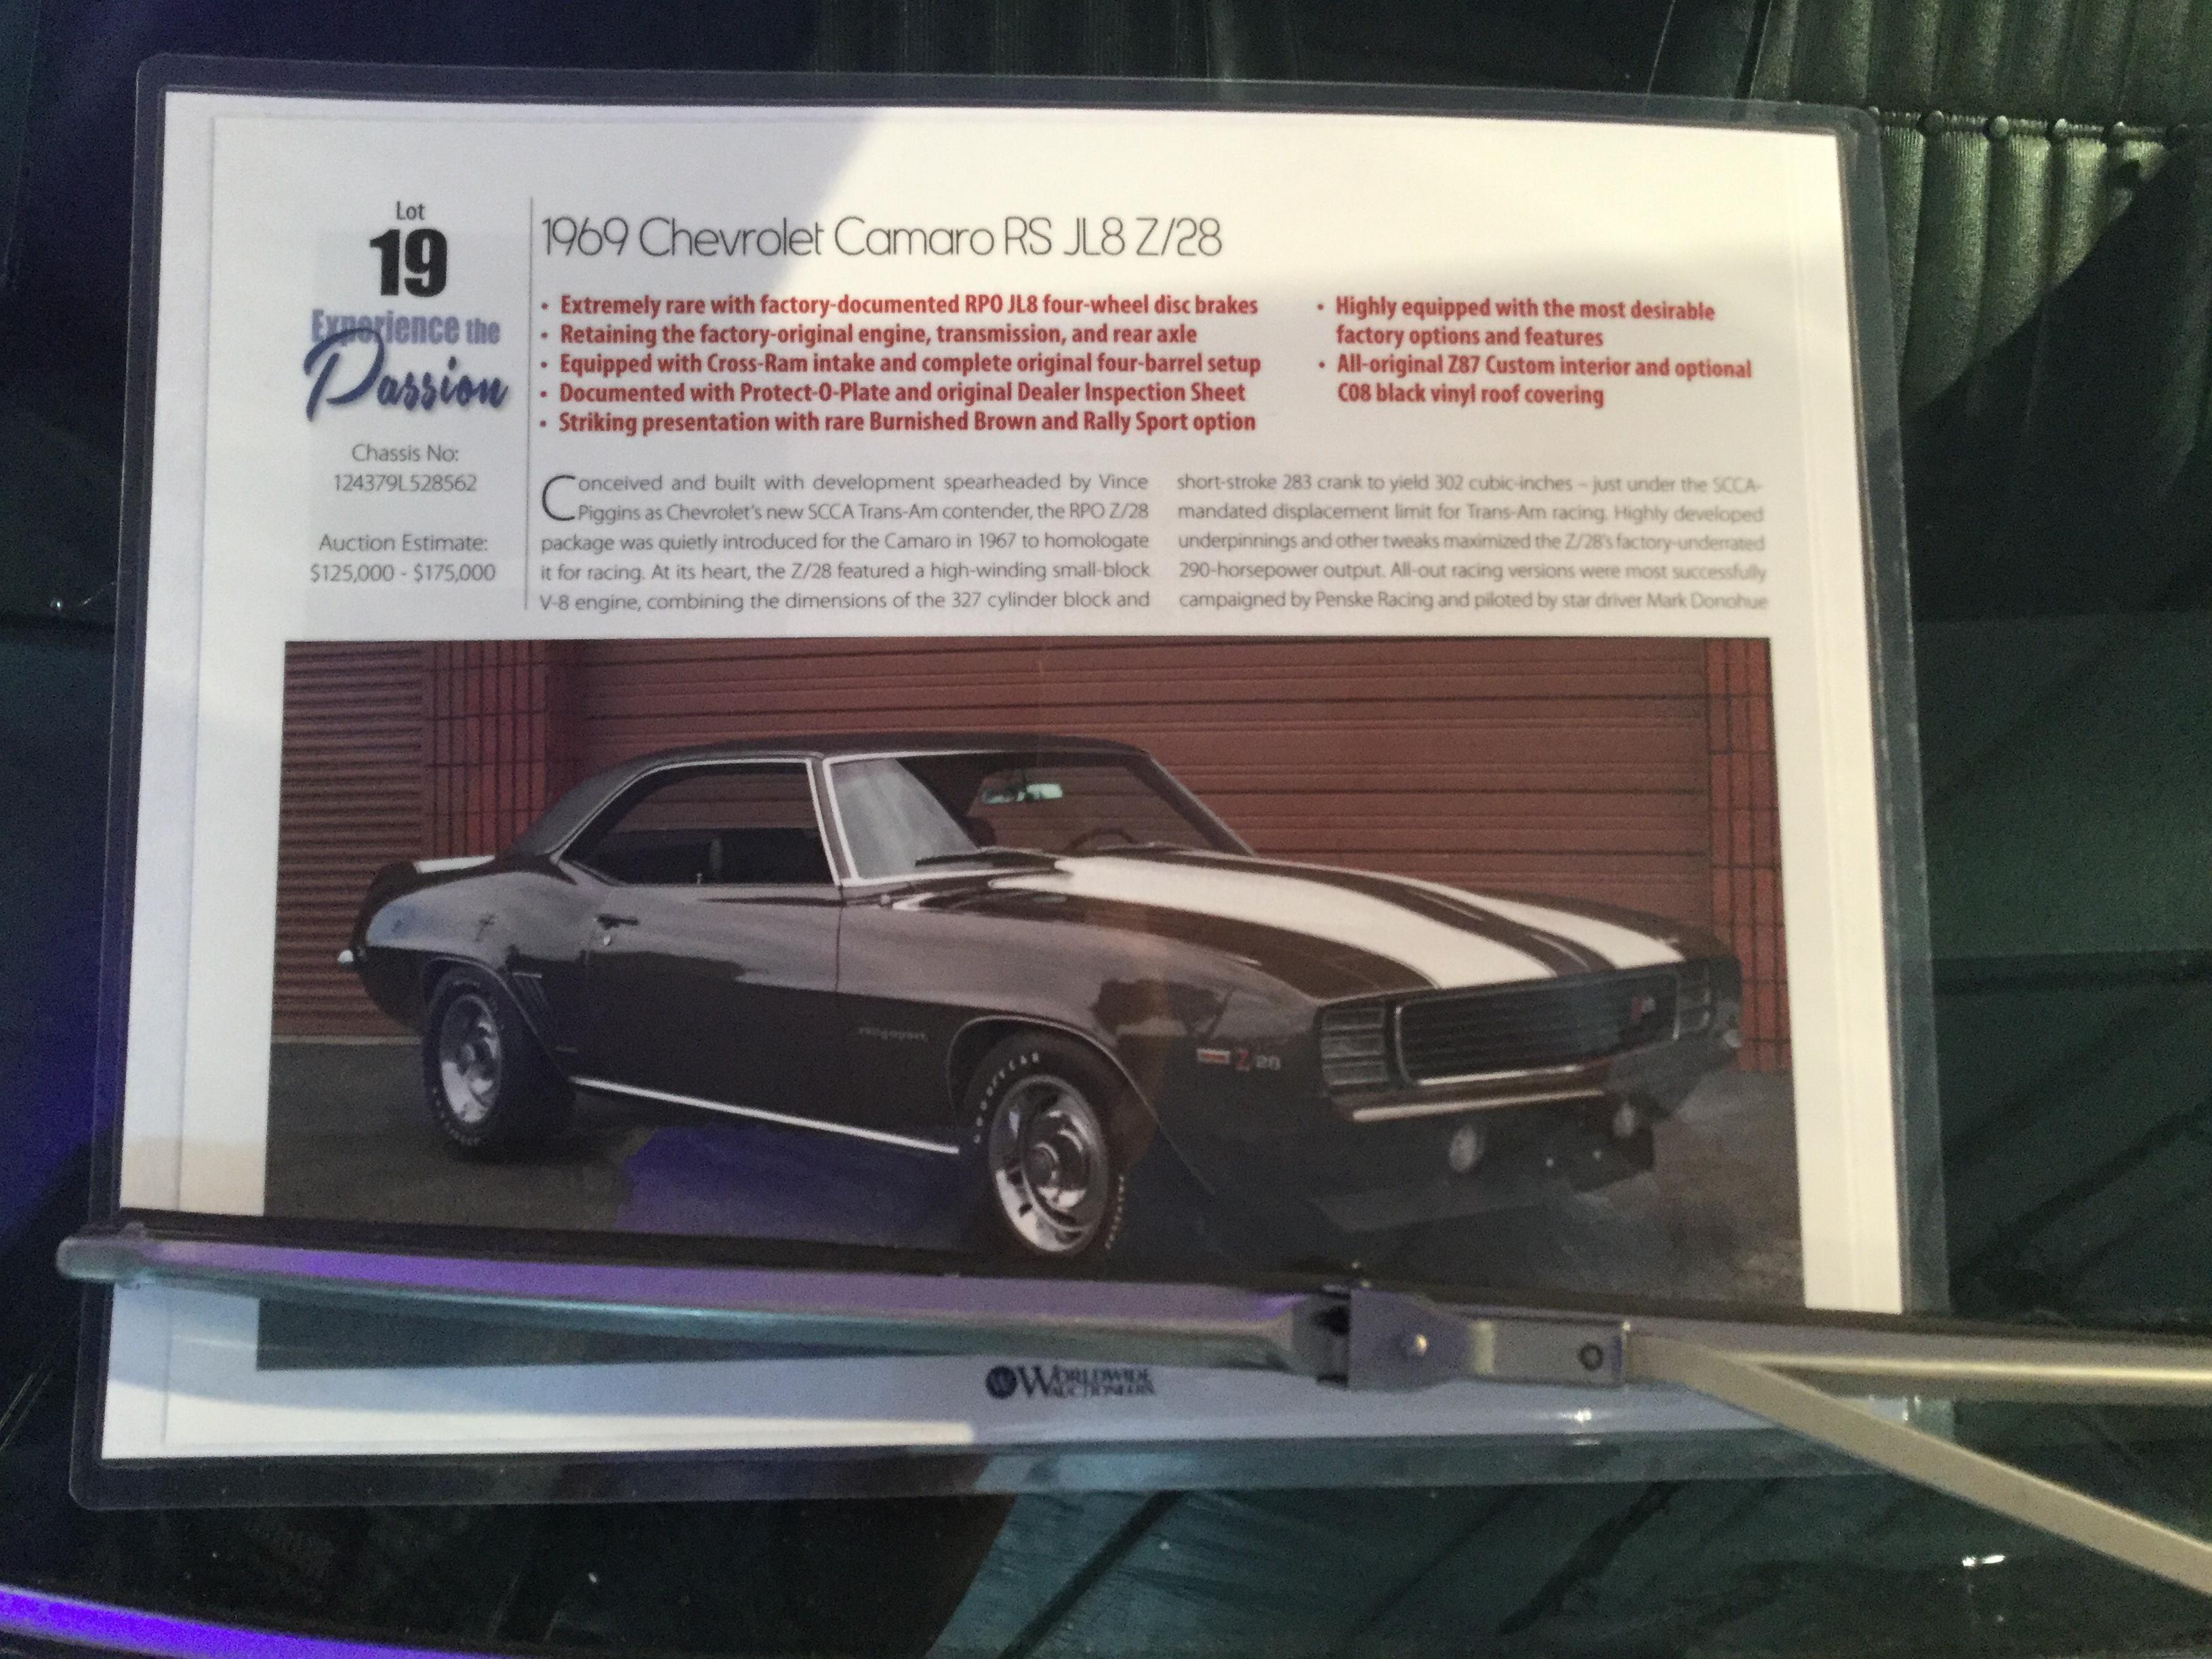 1969 Chevrolet Camaro Values Hagerty Valuation Tool